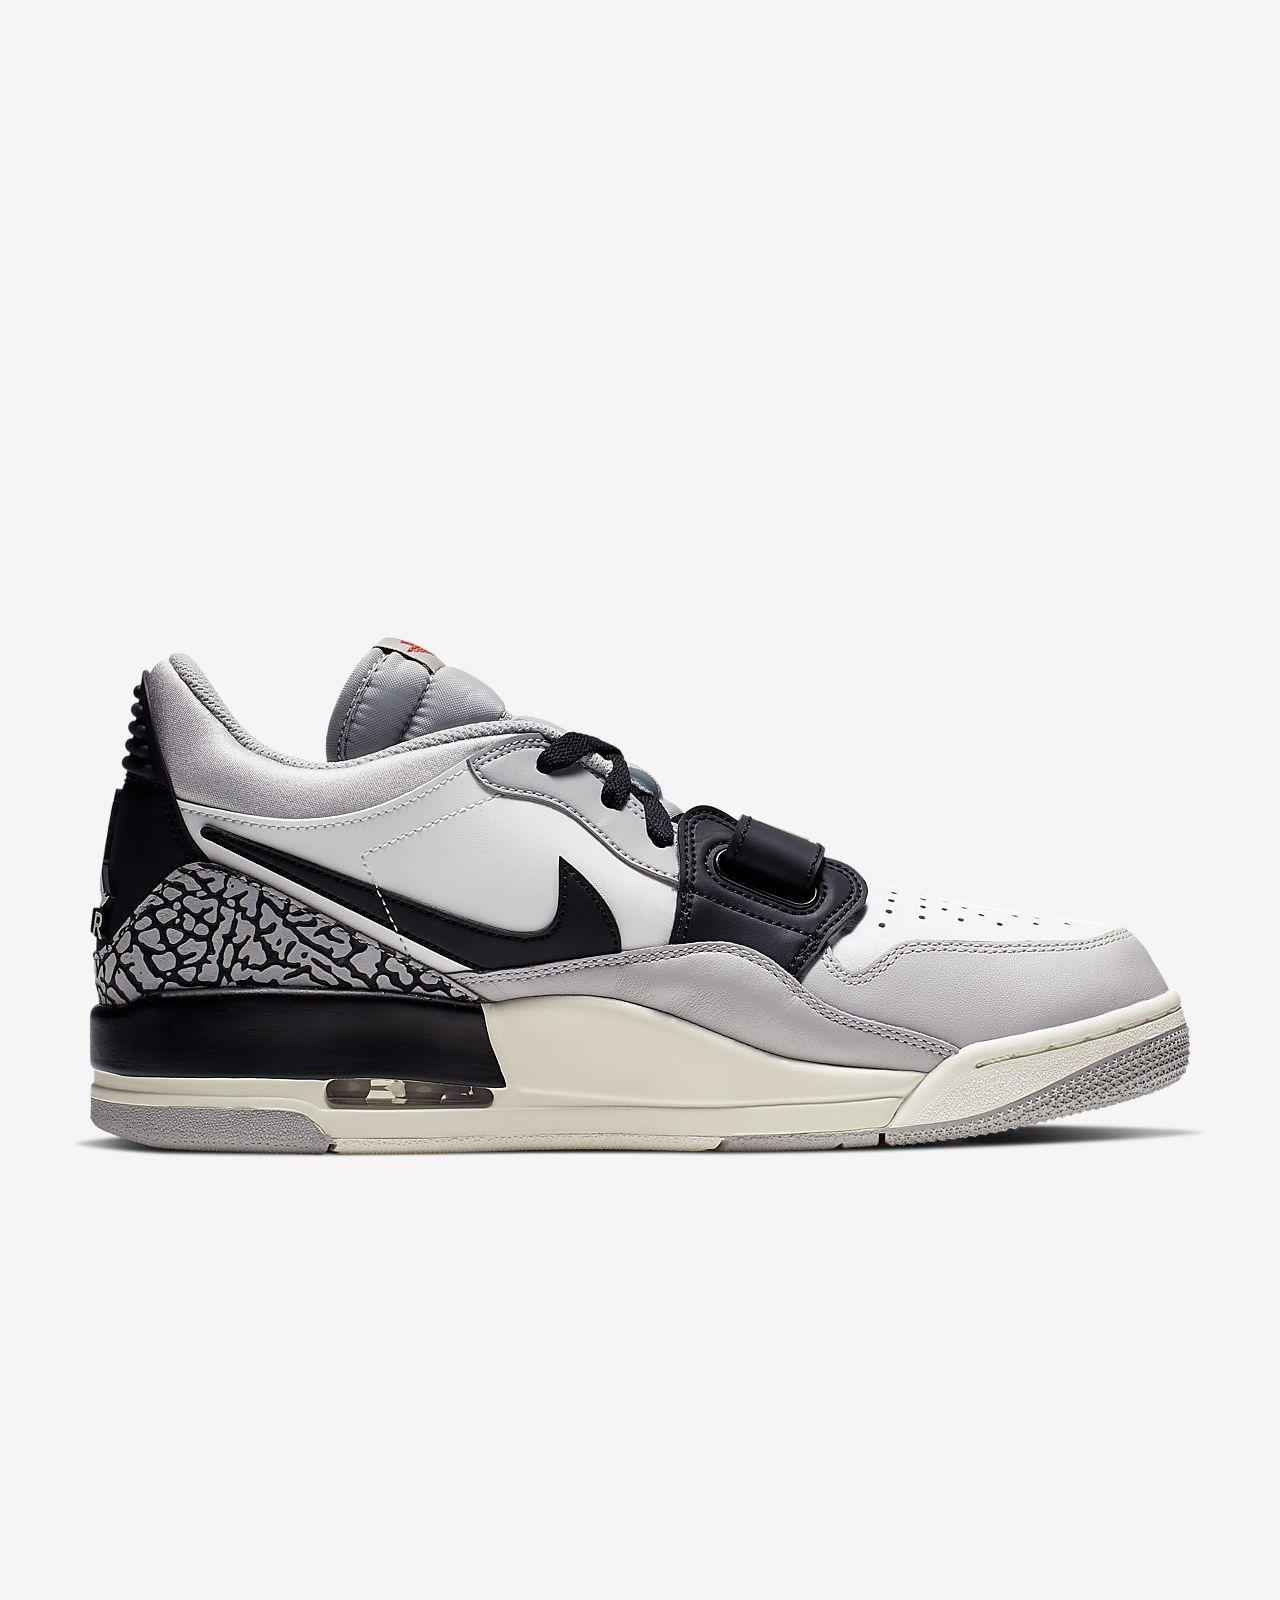 def1709e68d Air Jordan Legacy 312 Low Herenschoen. Nike.com BE